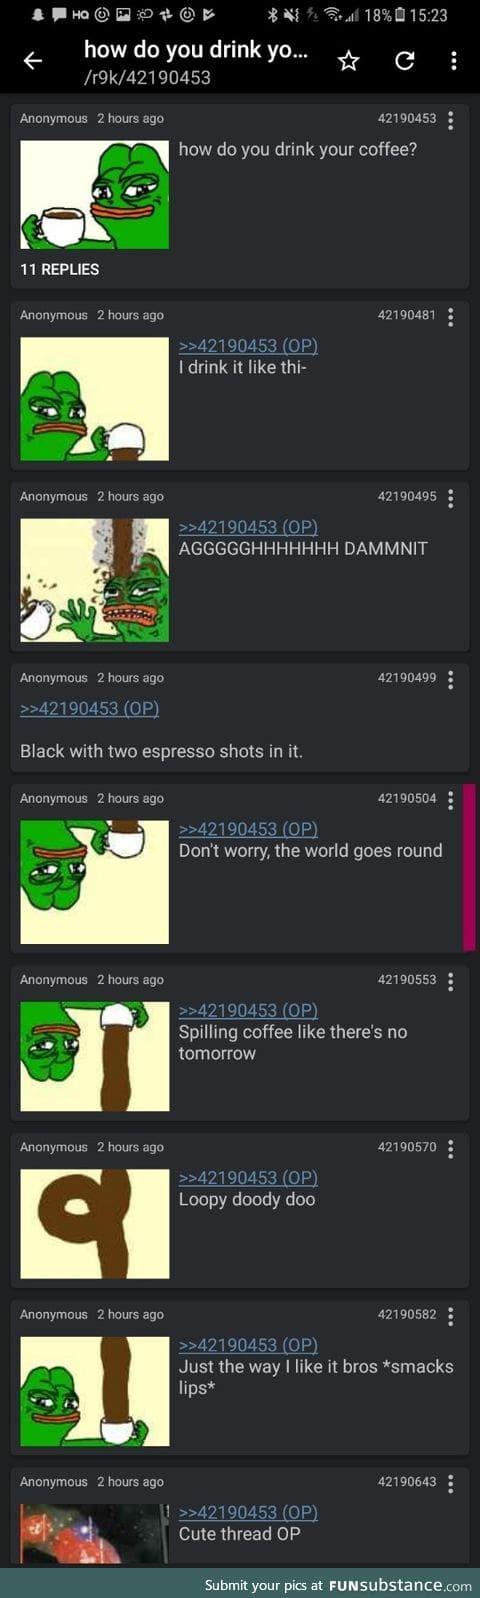 Anon drinks coffee